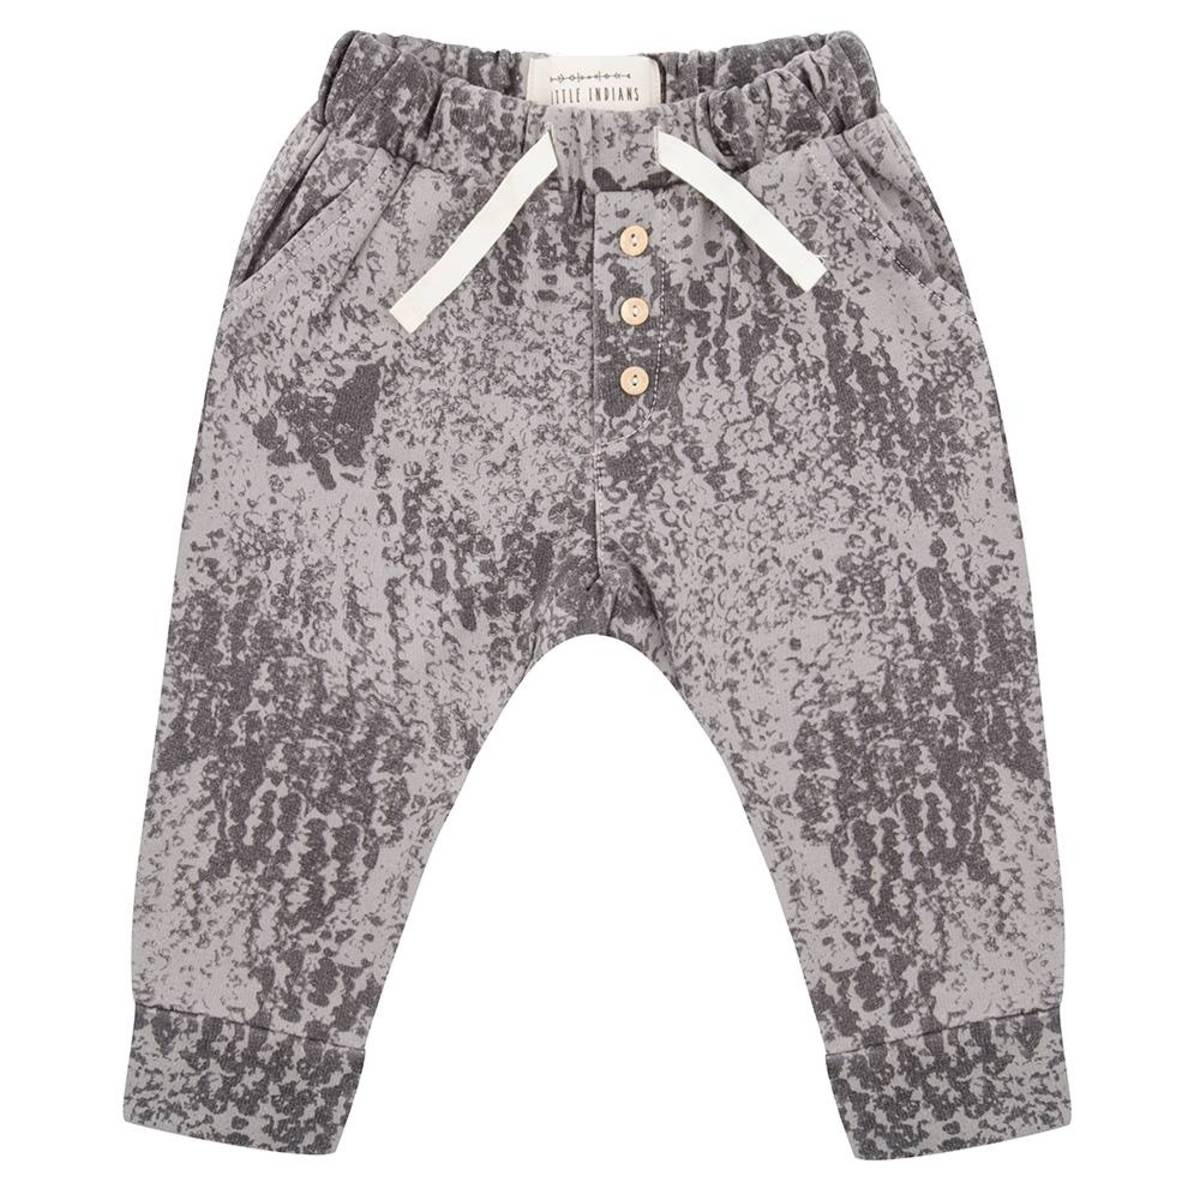 Bas Bébé Pantalon World Broek Gris - 18/24 mois Pantalon World Broek Gris - 18/24 mois